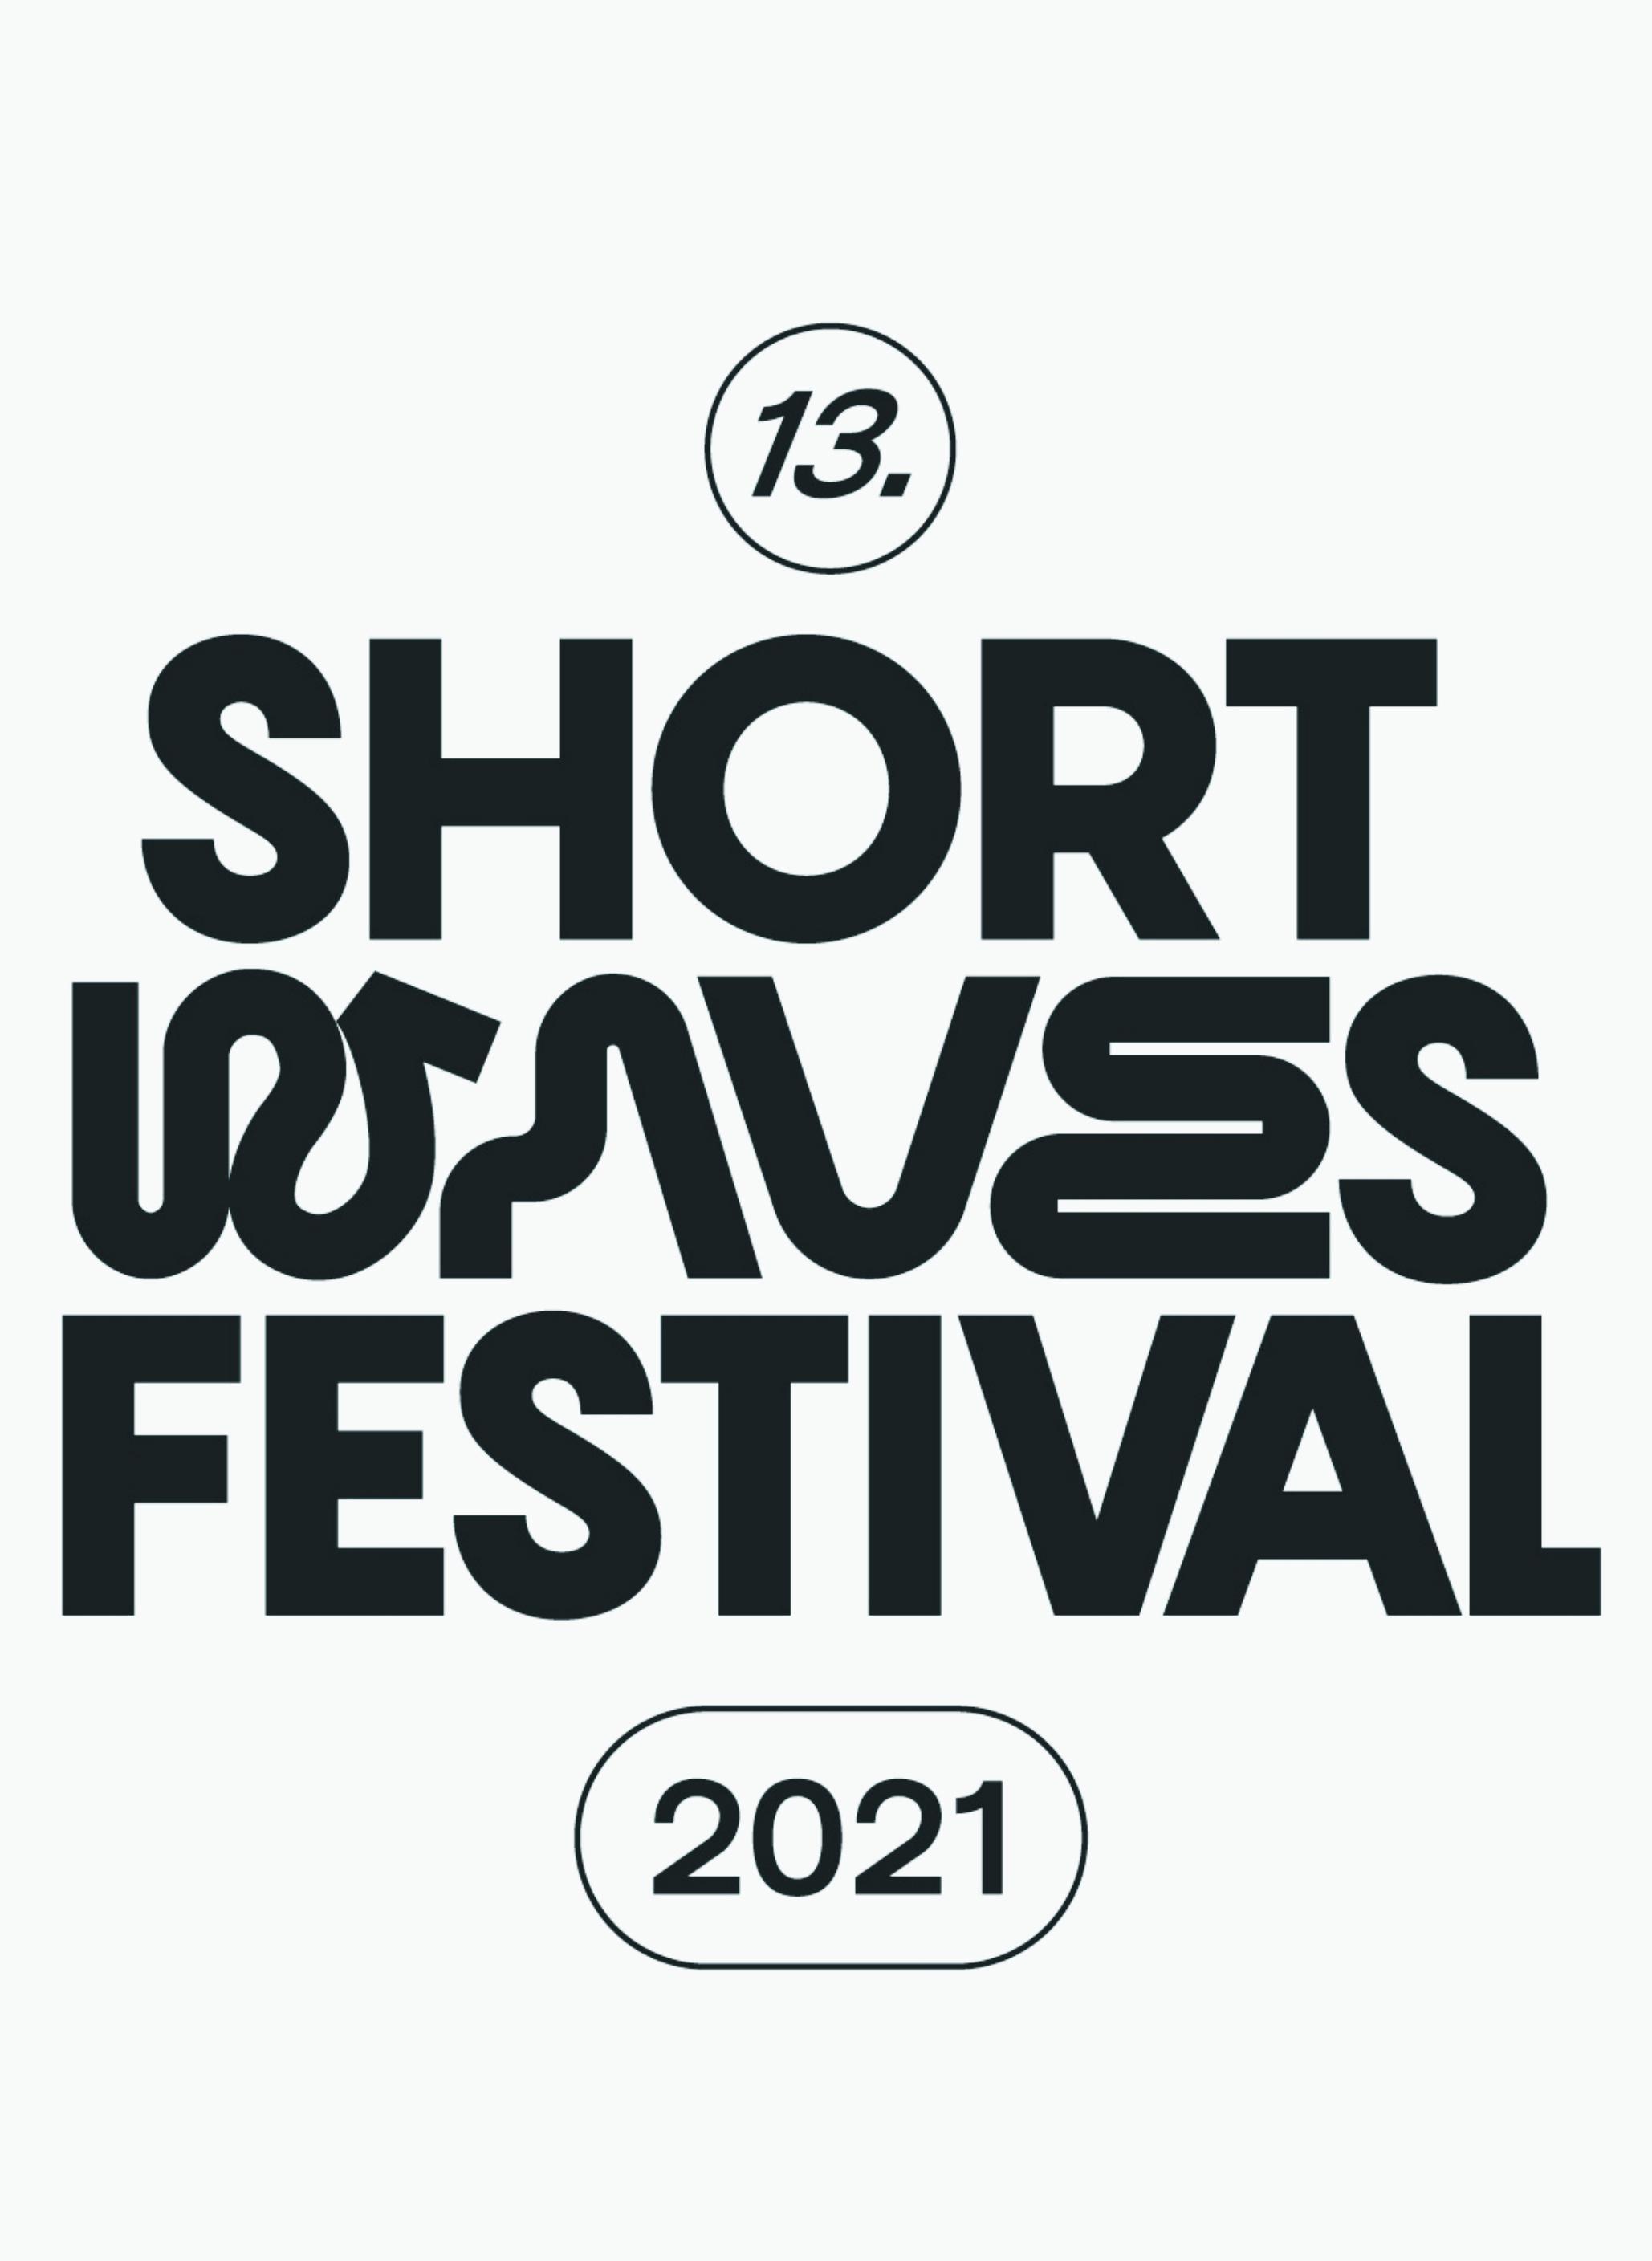 Short Waves Festival 2021 - Kinky Shorts